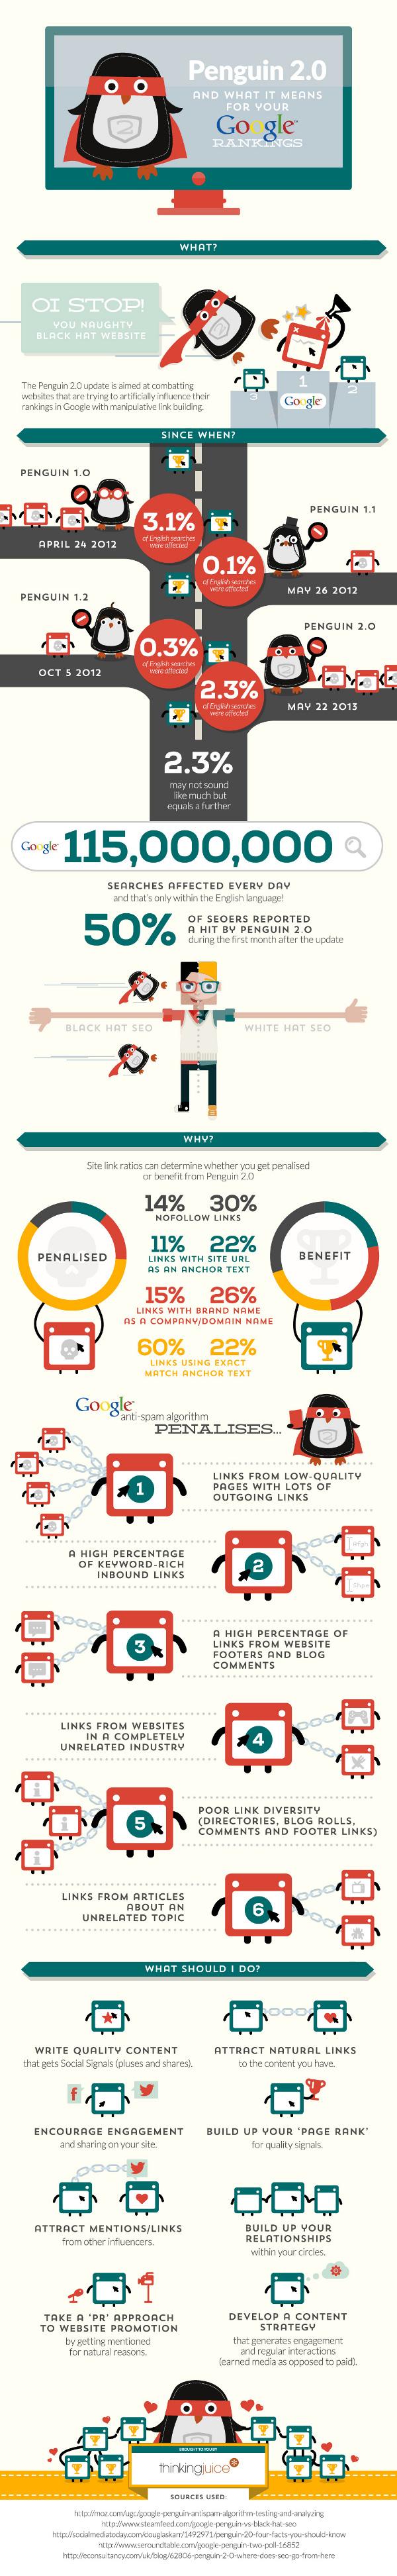 Alles über Googles Penguin Update 2.0